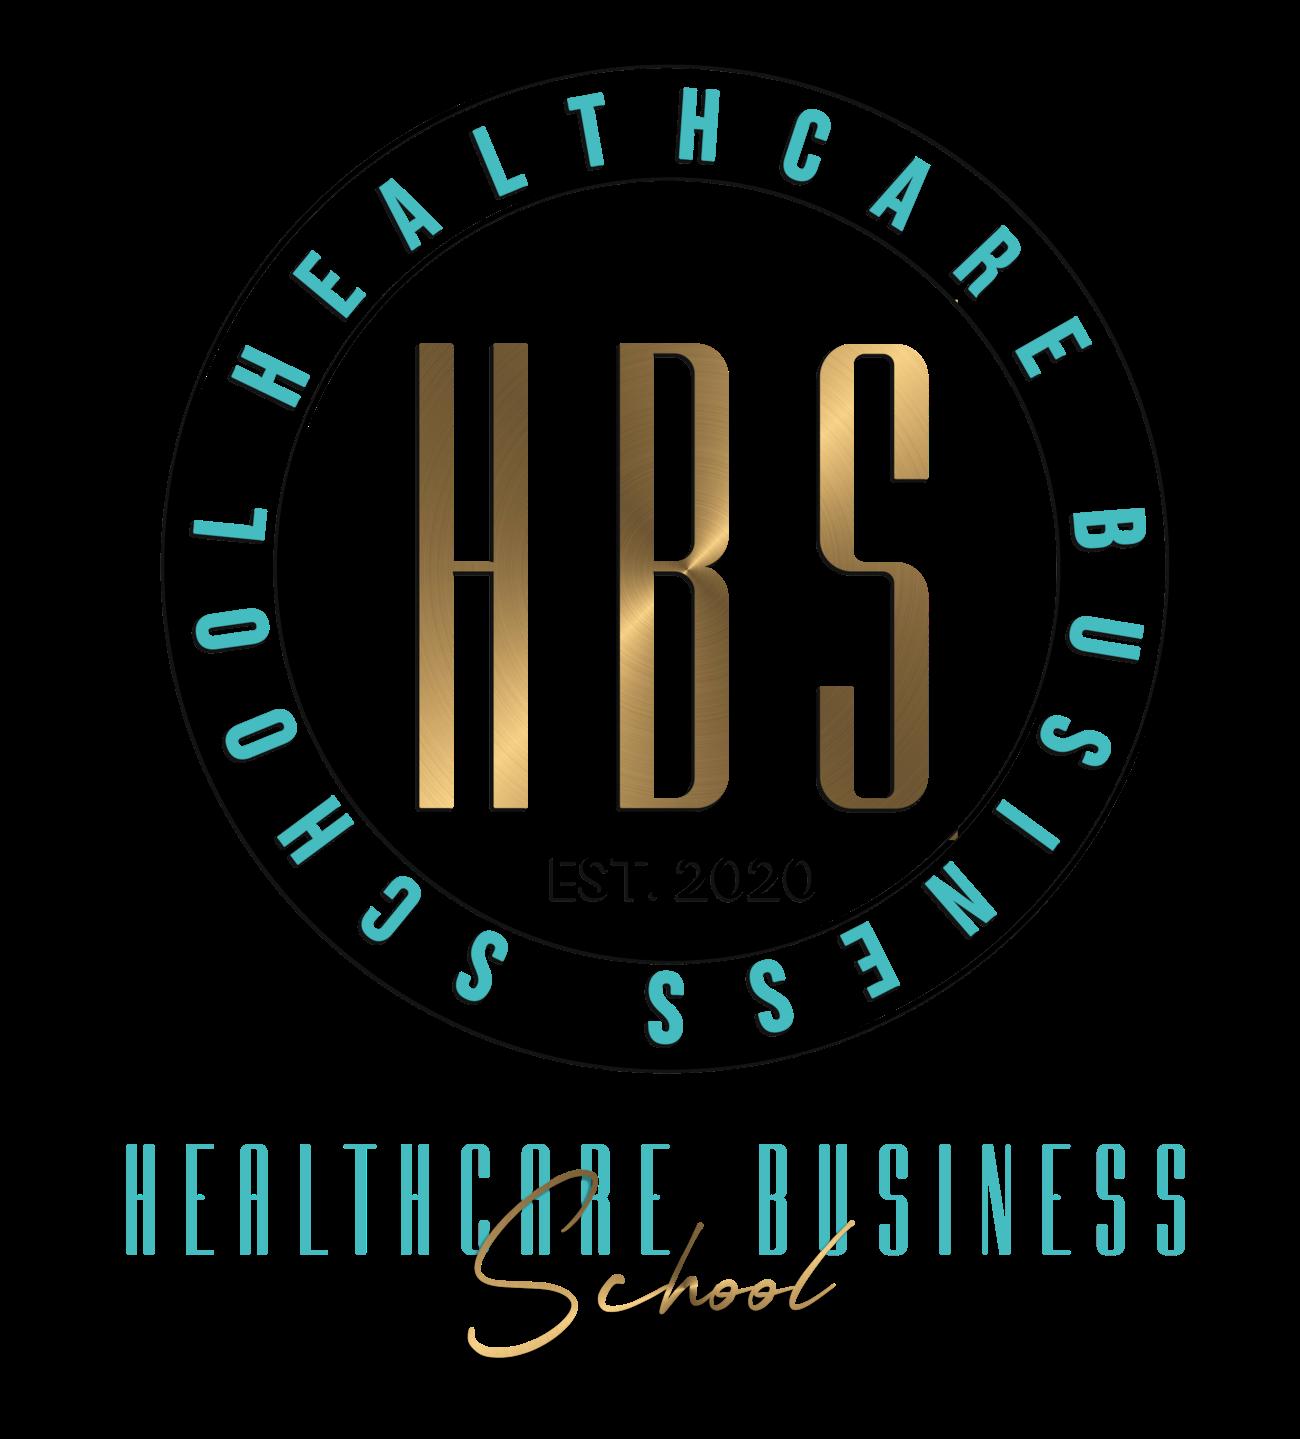 Logo - health care busines school